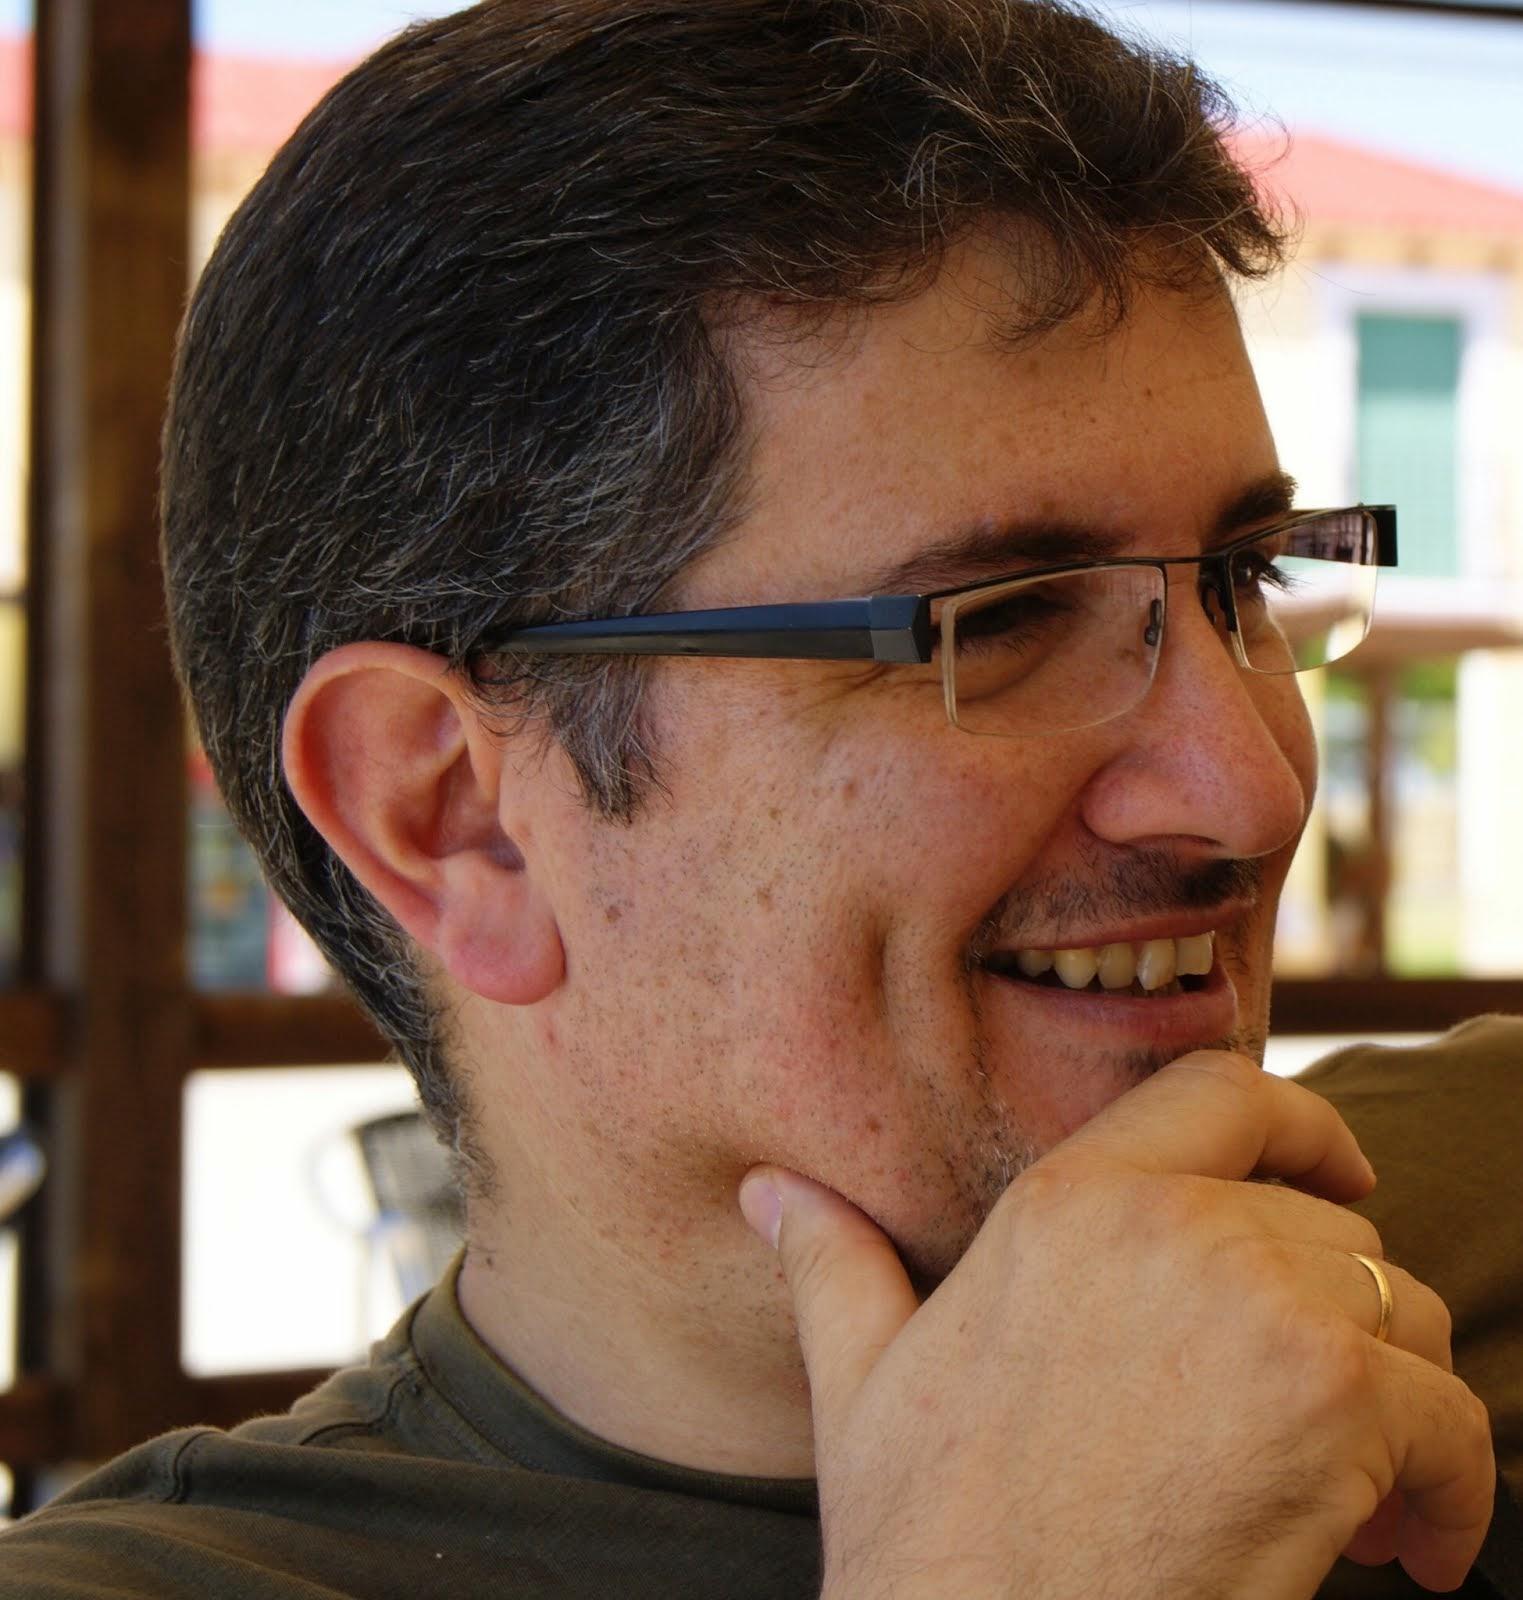 Fernando Méndez Moratalla